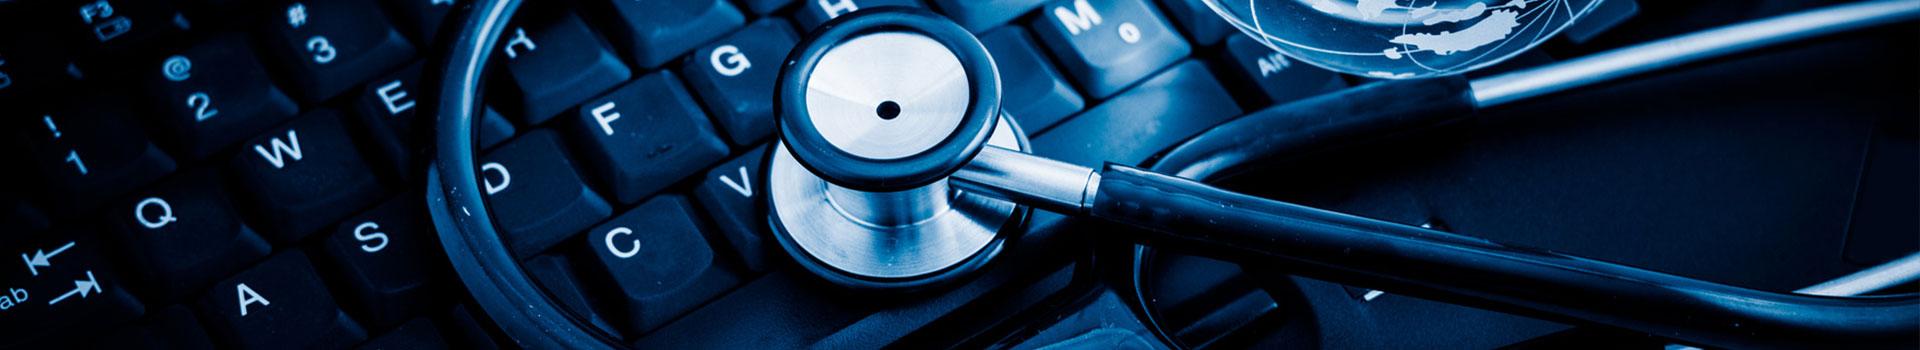 medical.jpg - 112.06 kB